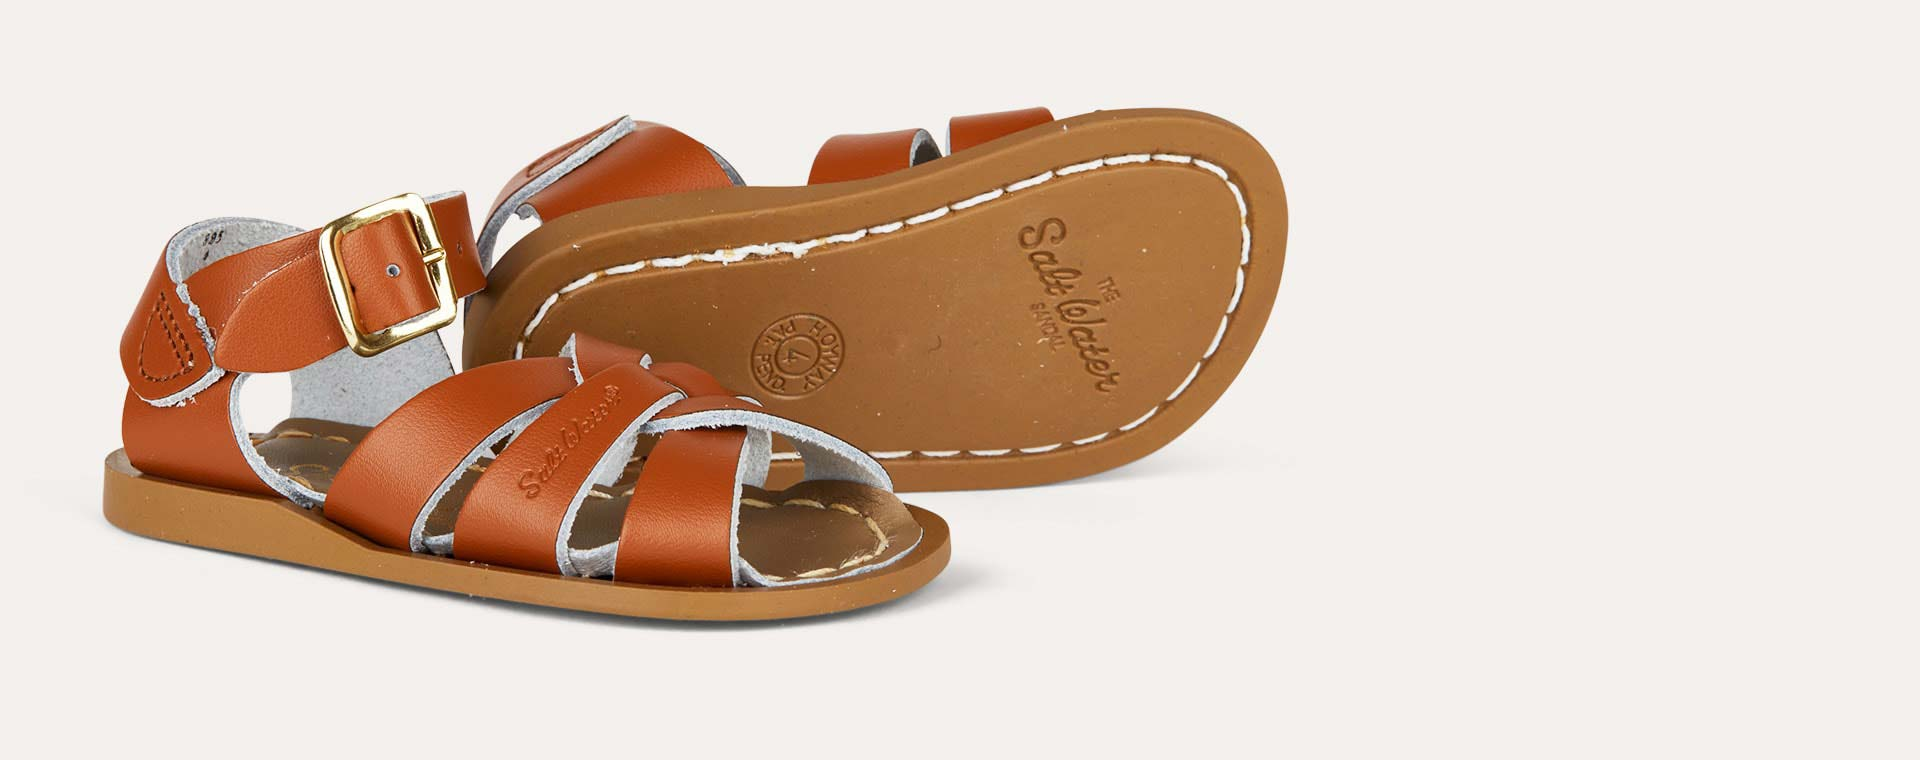 Tan Salt-Water Sandals The Original Salt Water Sandal